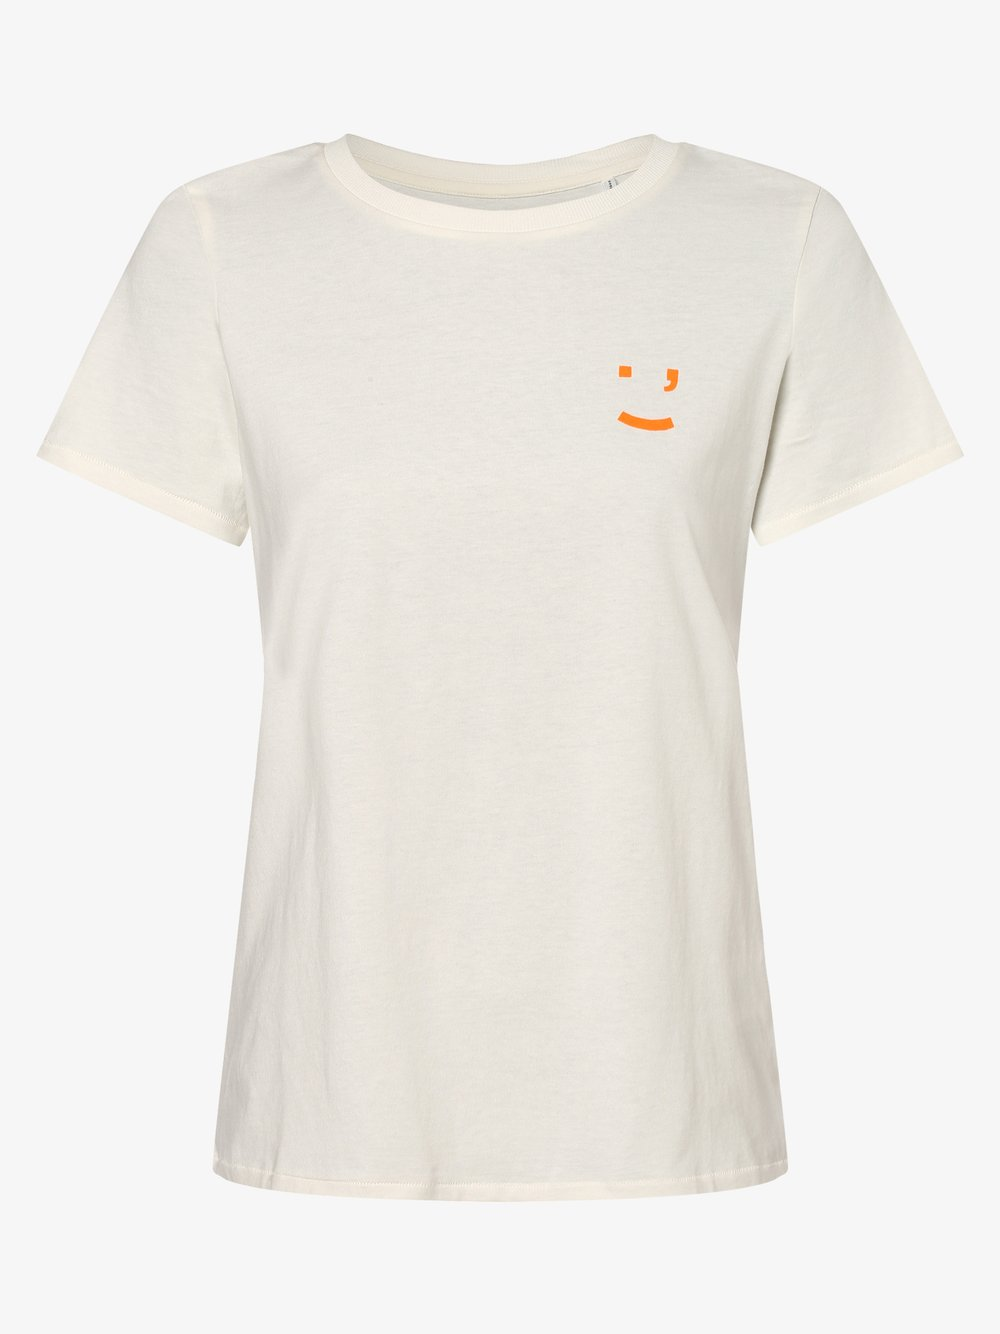 Marc O'Polo Denim – T-shirt damski, biały Van Graaf 460921-0001-09920